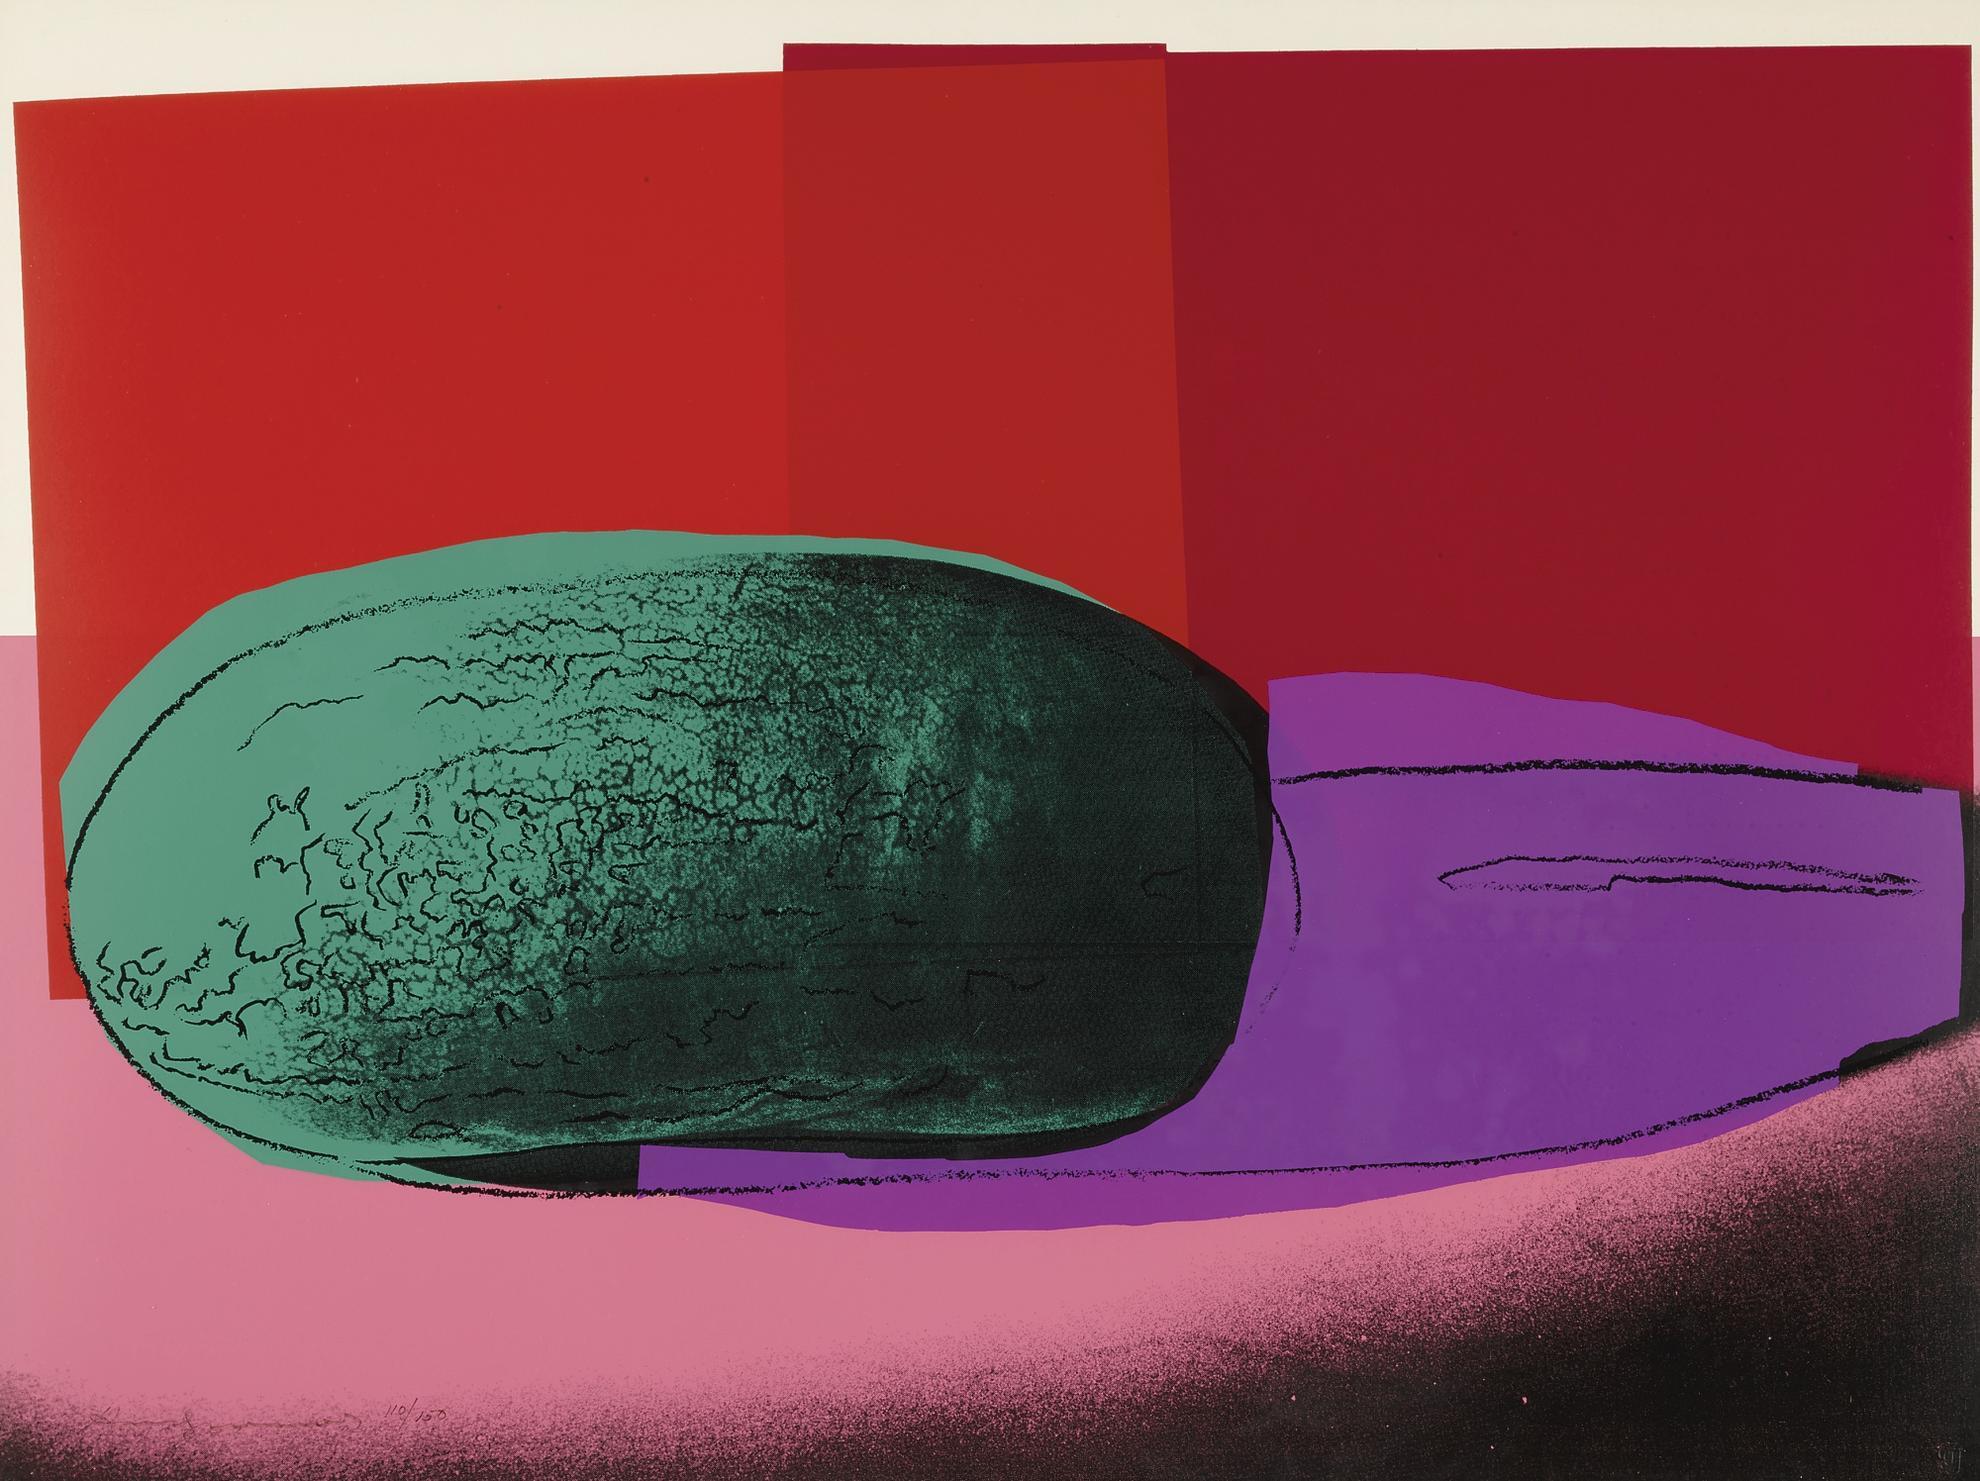 Andy Warhol-Watermelon (F. & S. II.199)-1979